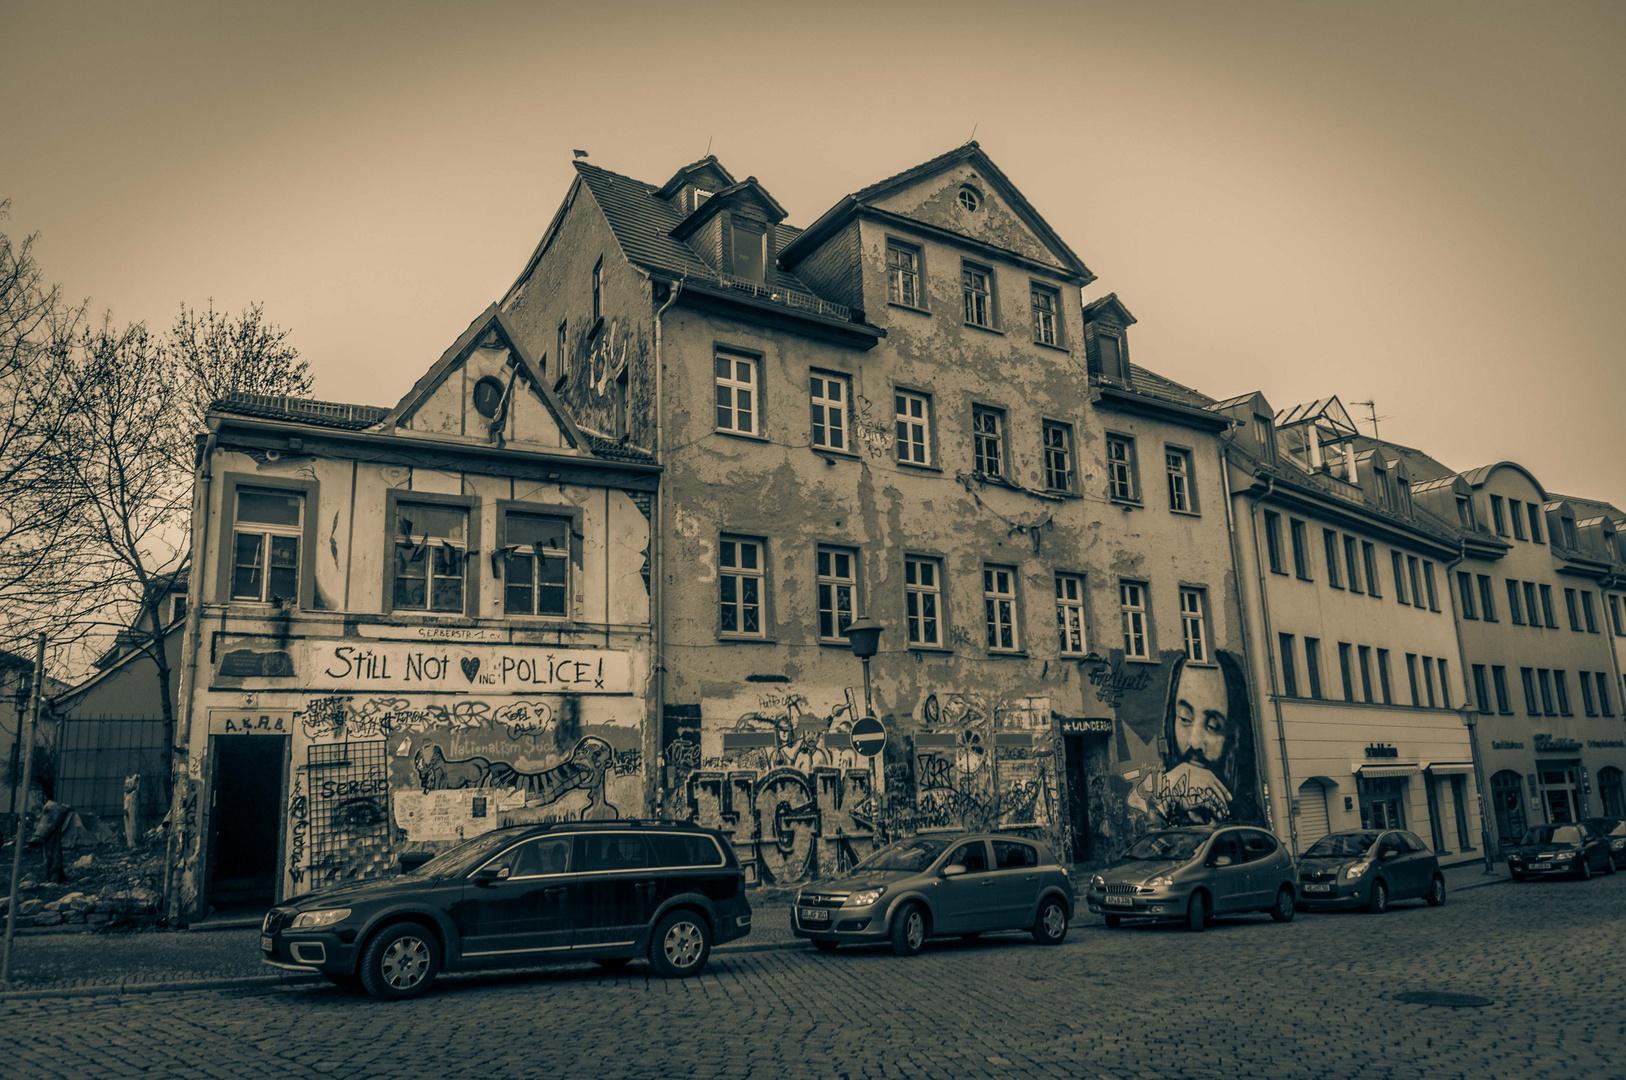 Altanatives Weimar